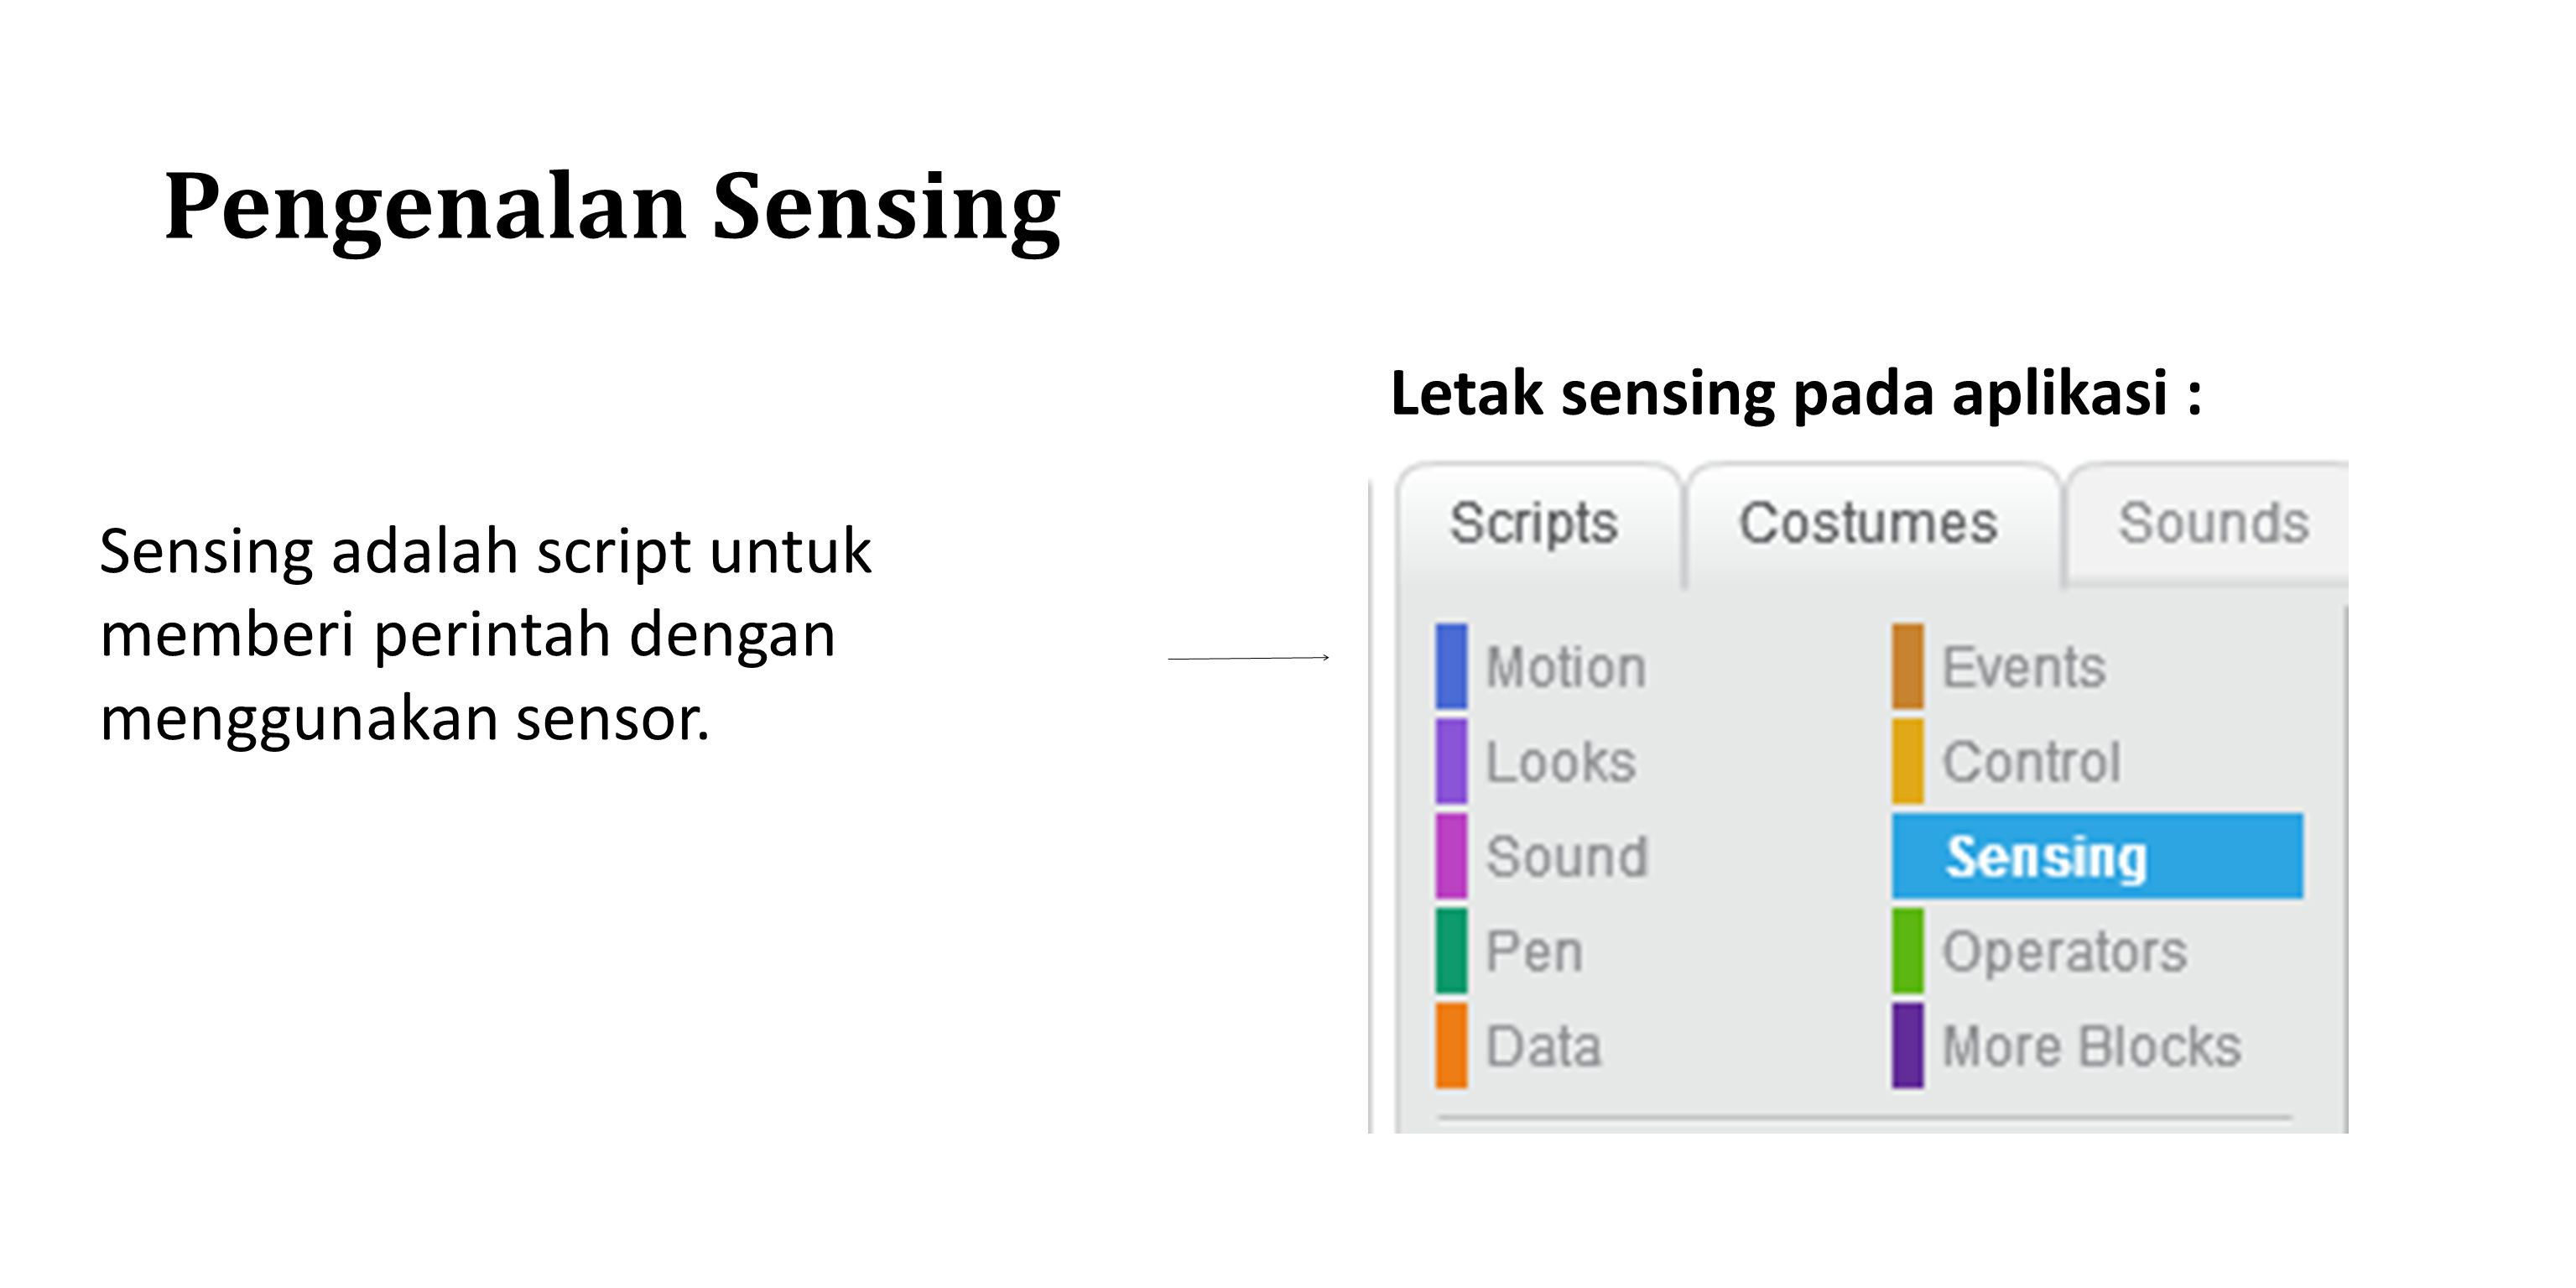 Pengenalan Sensing Letak sensing pada aplikasi :